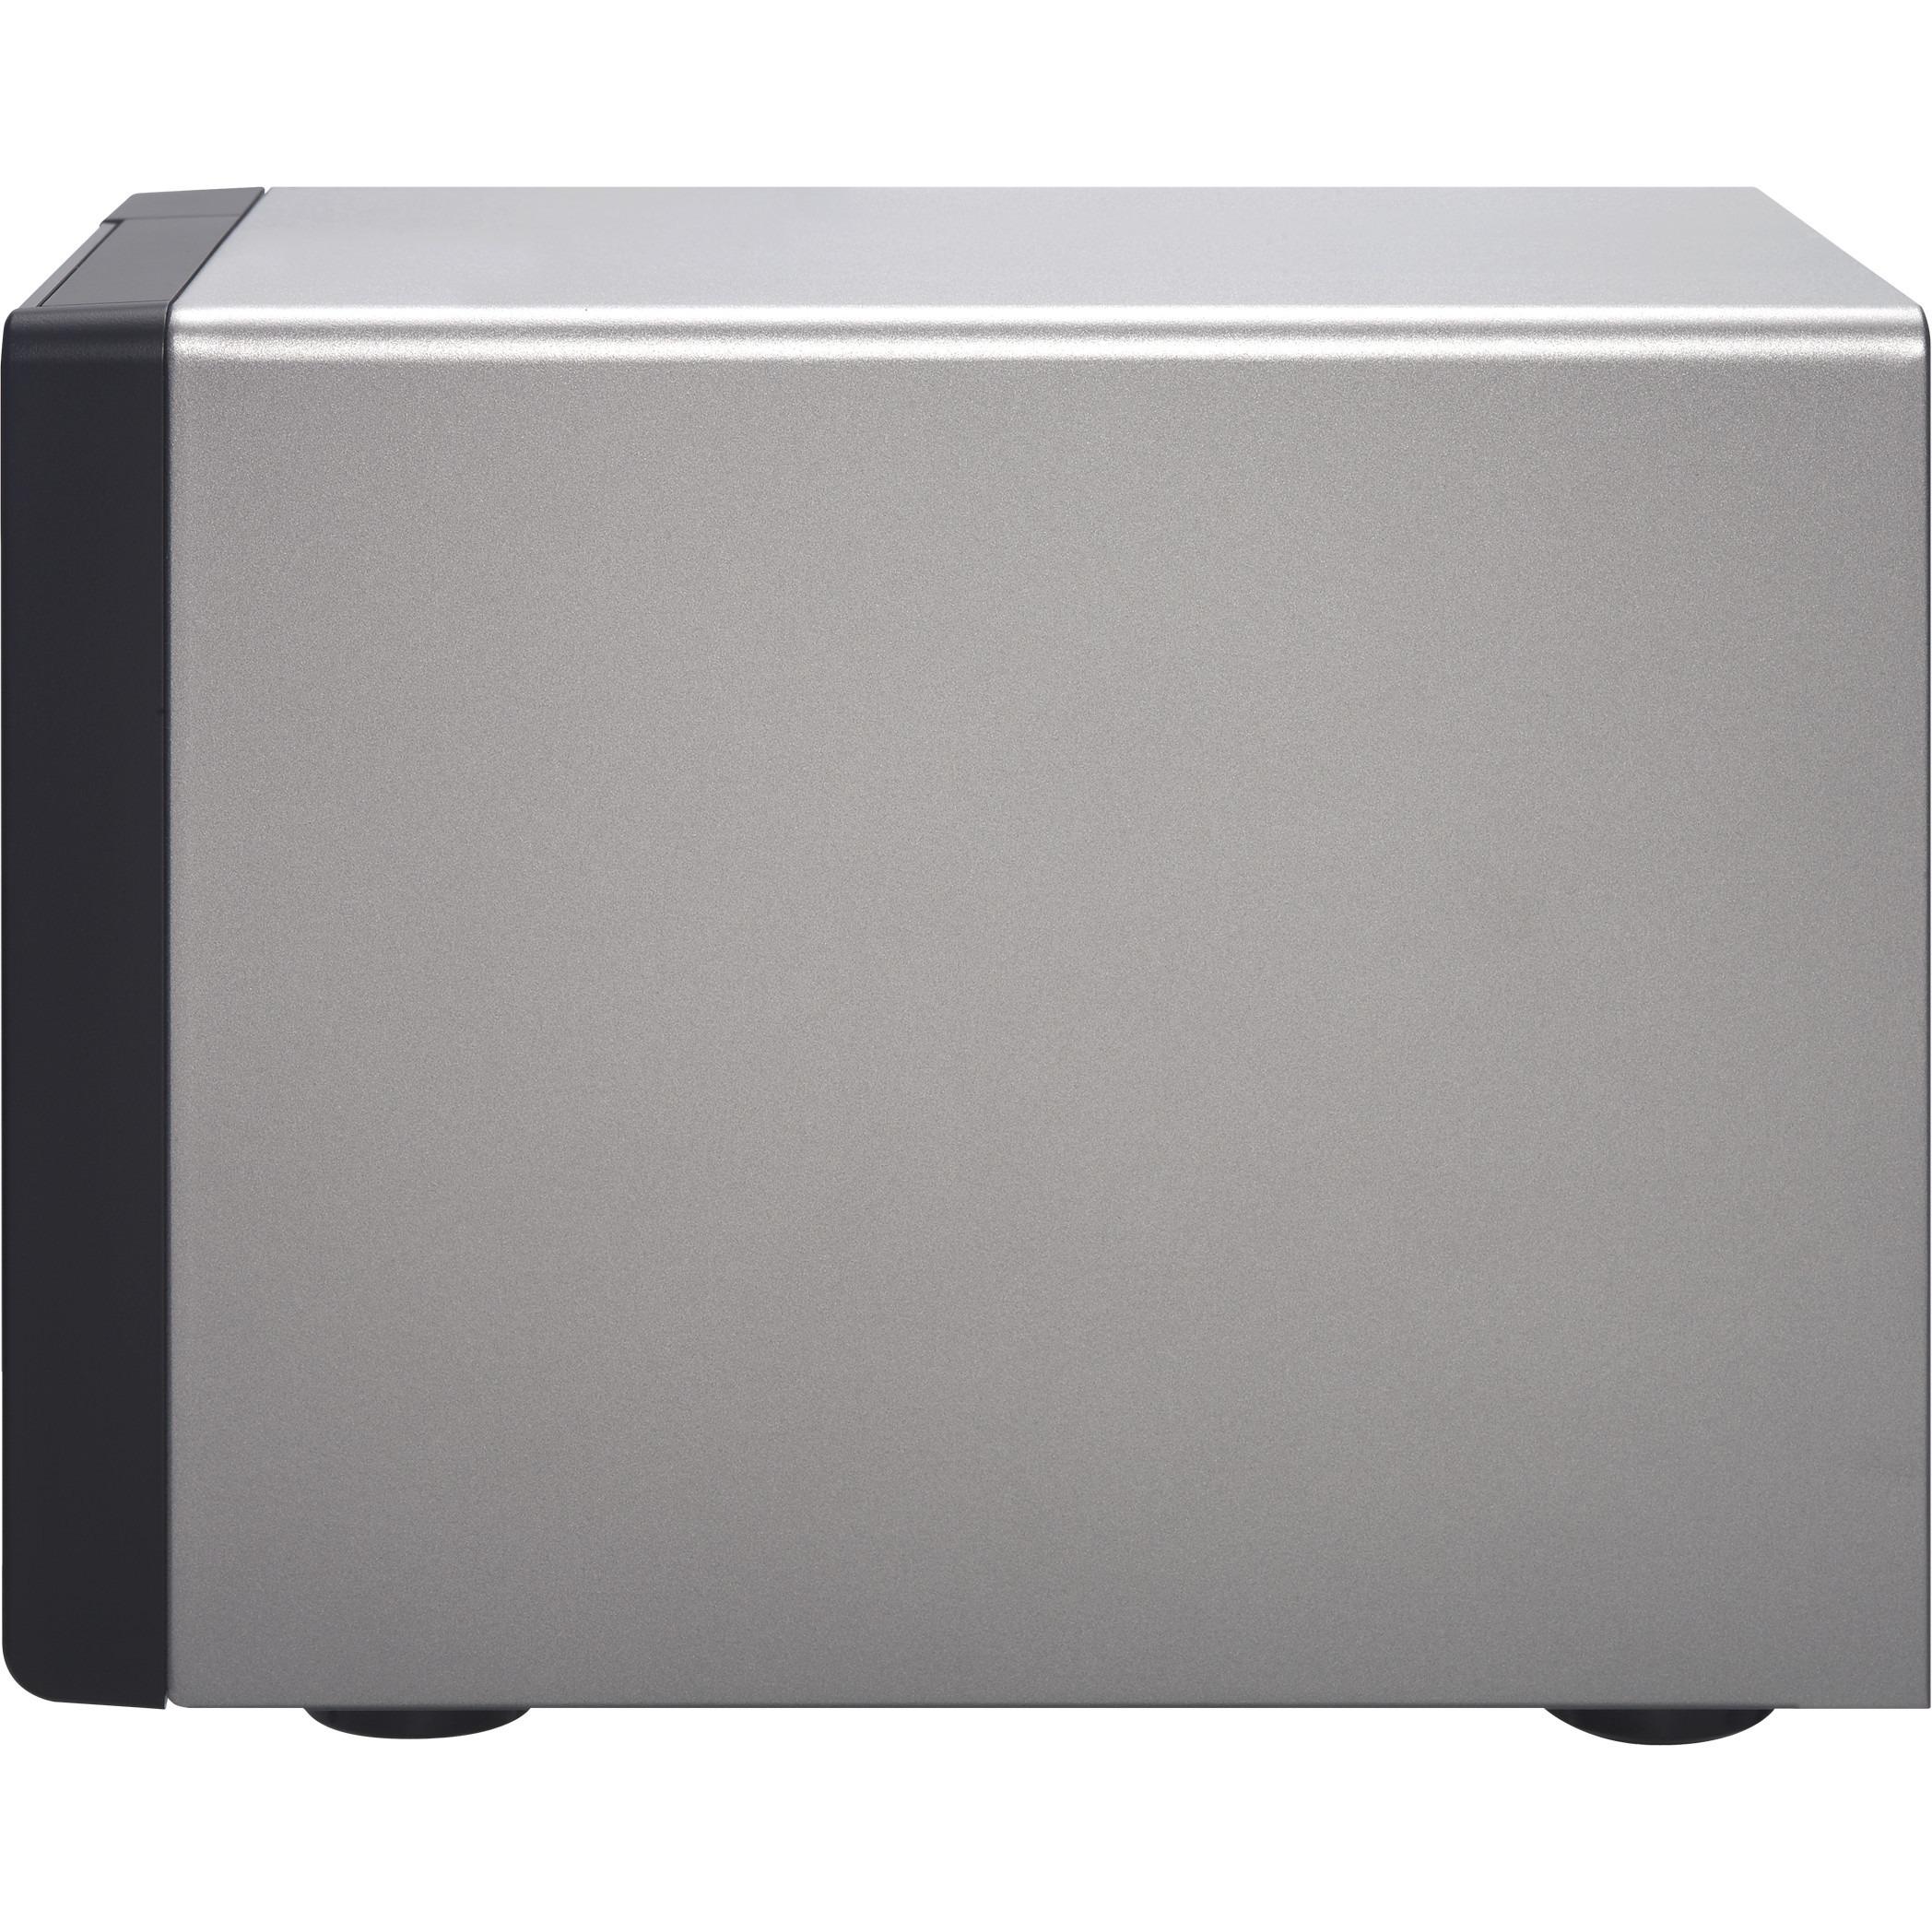 QNAP Turbo vNAS TVS-471 4 x Total Bays NAS Server - Tower - Intel Core i3 i3-4150 Dual-core 2 Core 3.50 GHz